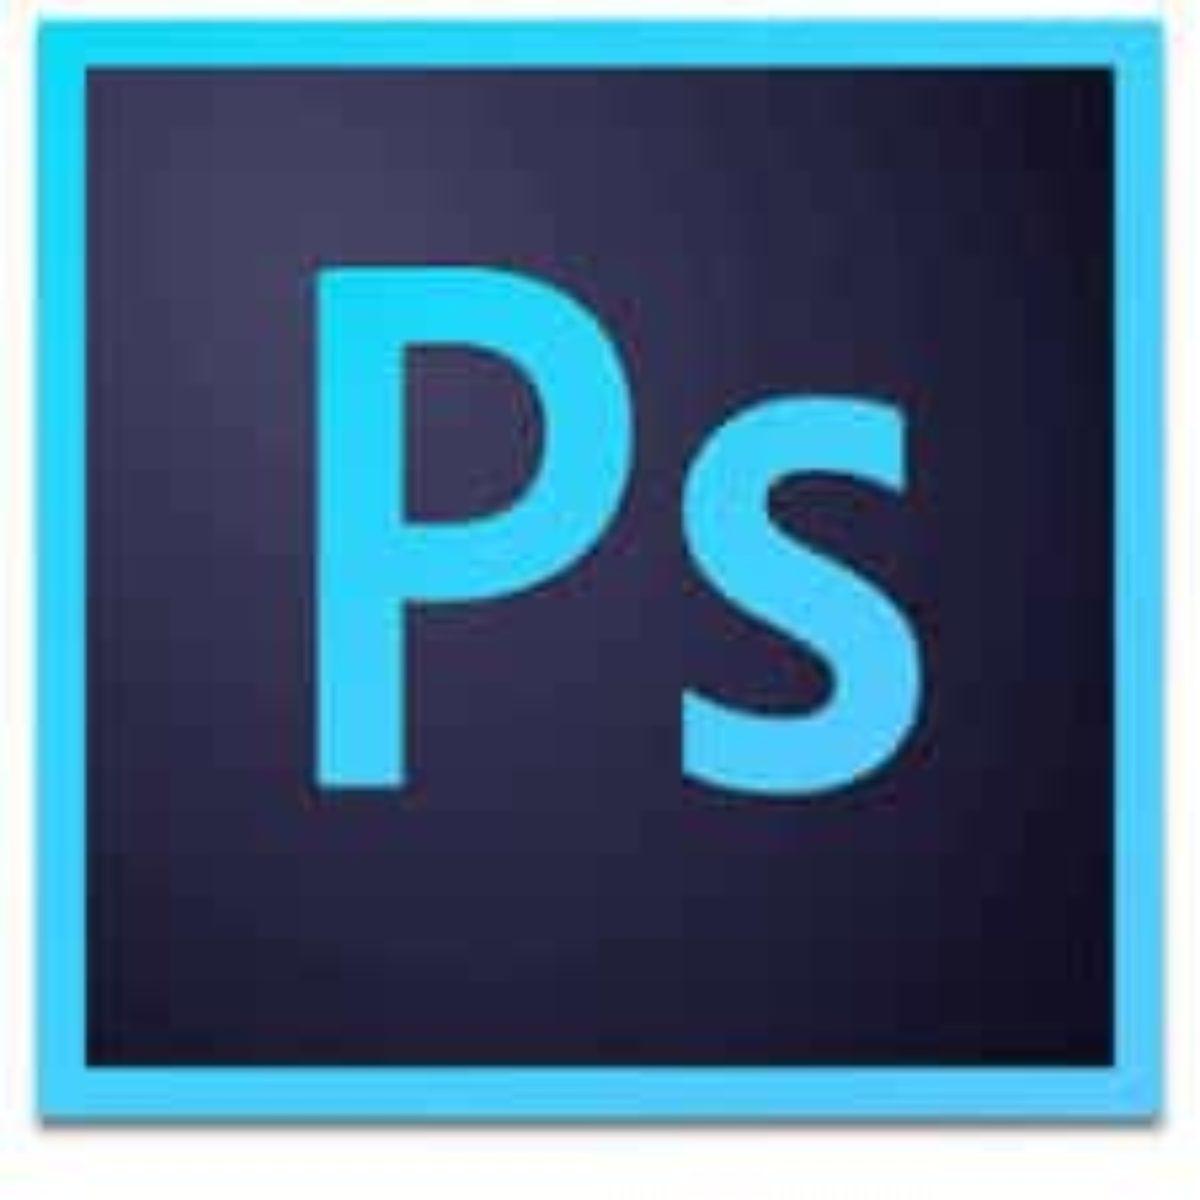 free adobe photoshop download for windows 7 64 bit